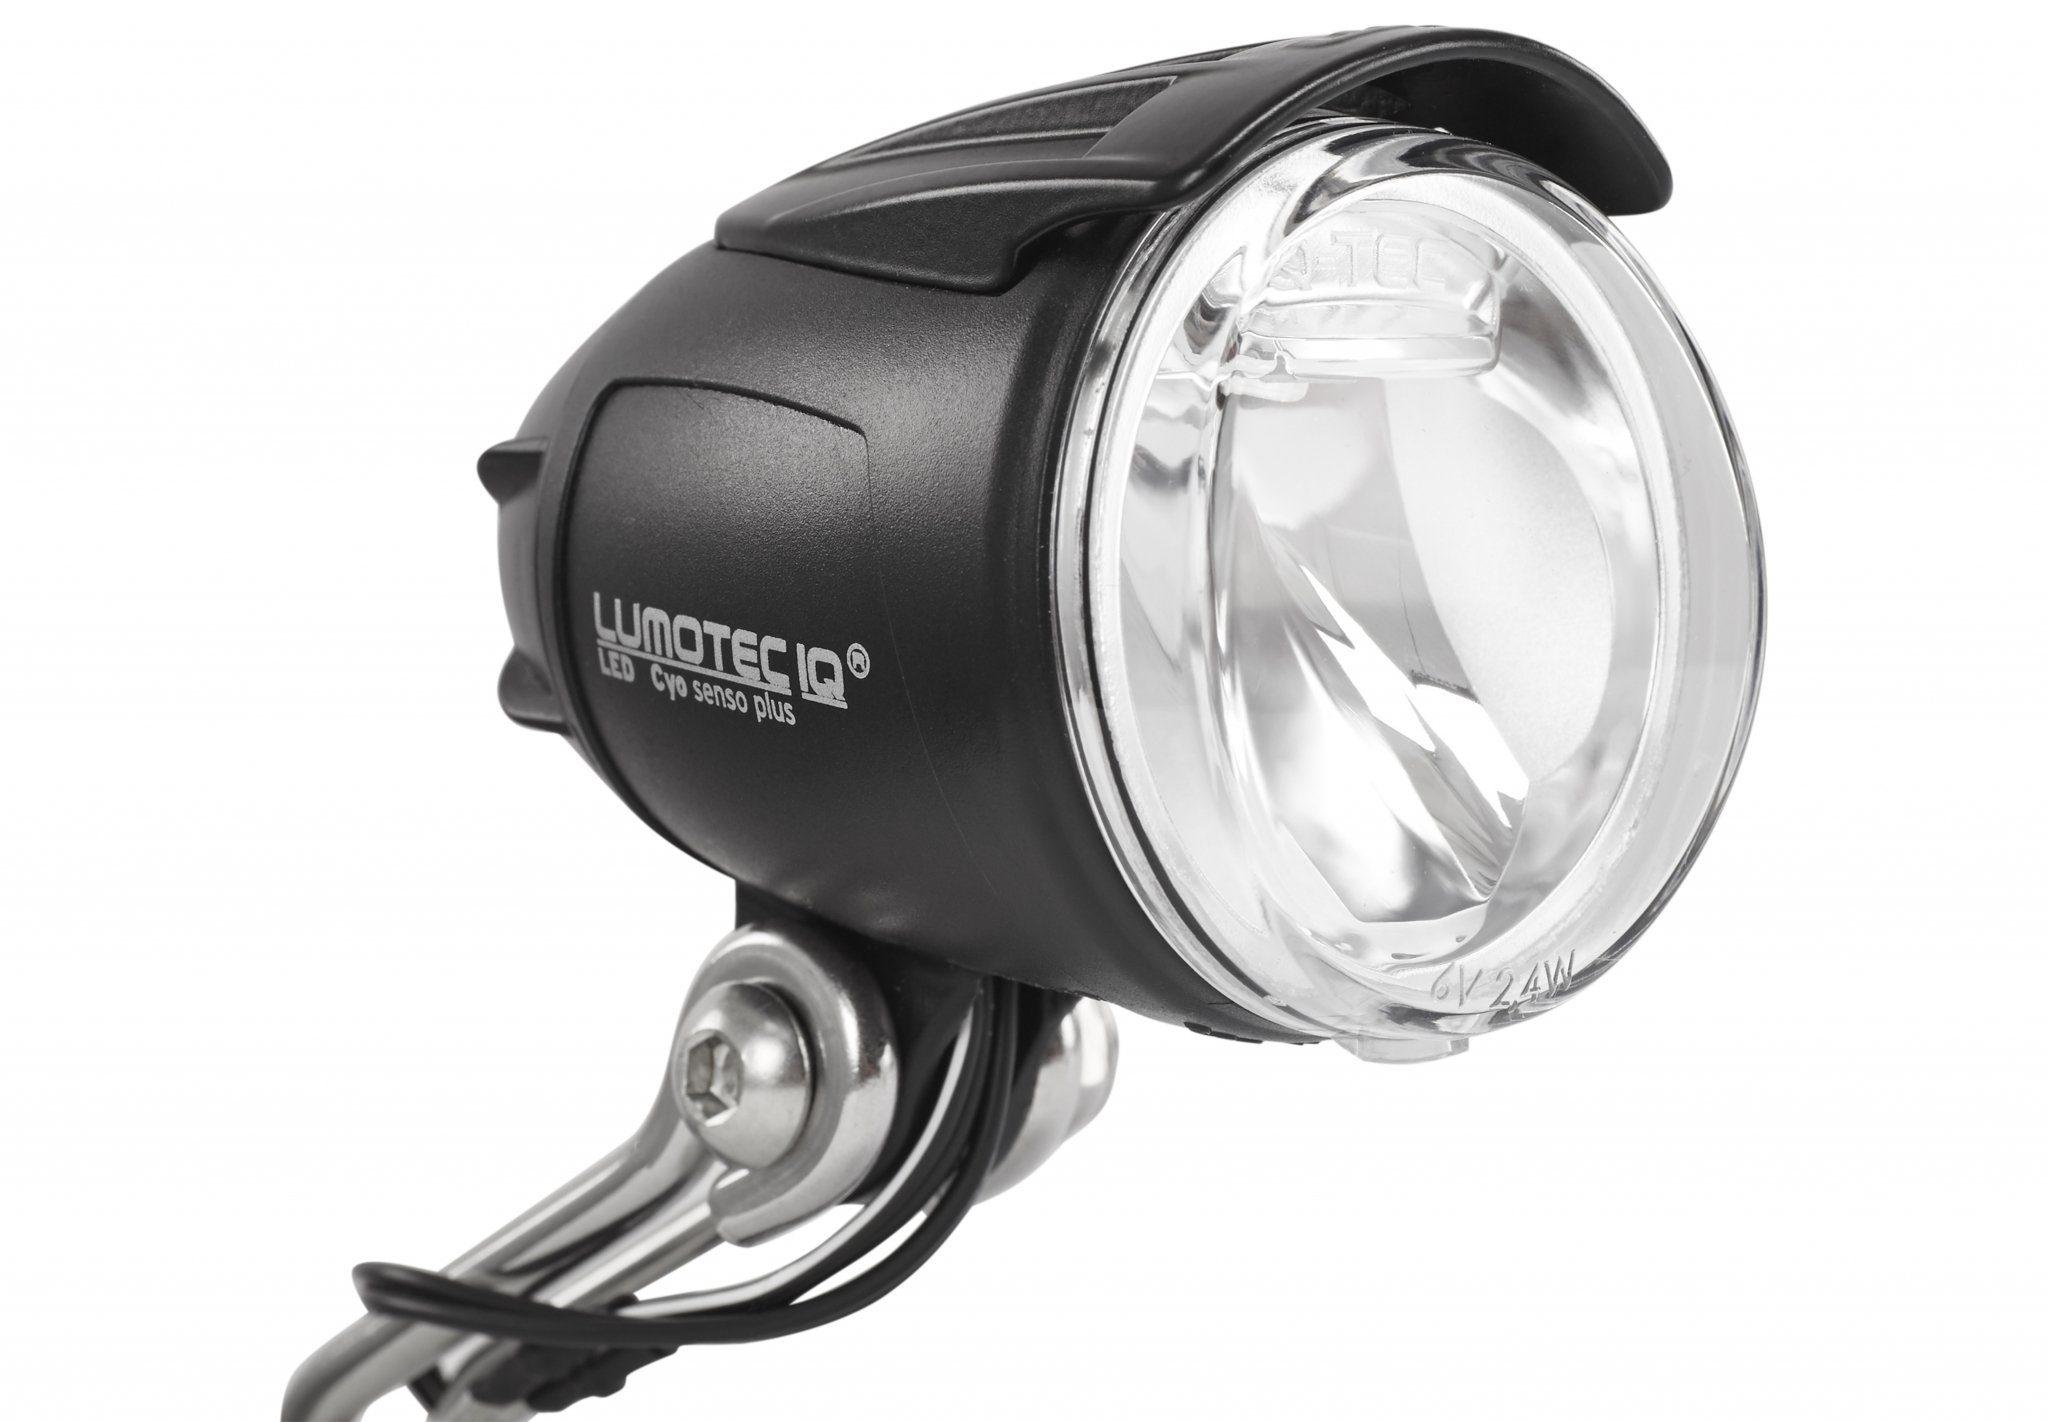 Busch + Müller Fahrradbeleuchtung »Lumotec IQ Cyo senso plus Frontscheinwerfer«